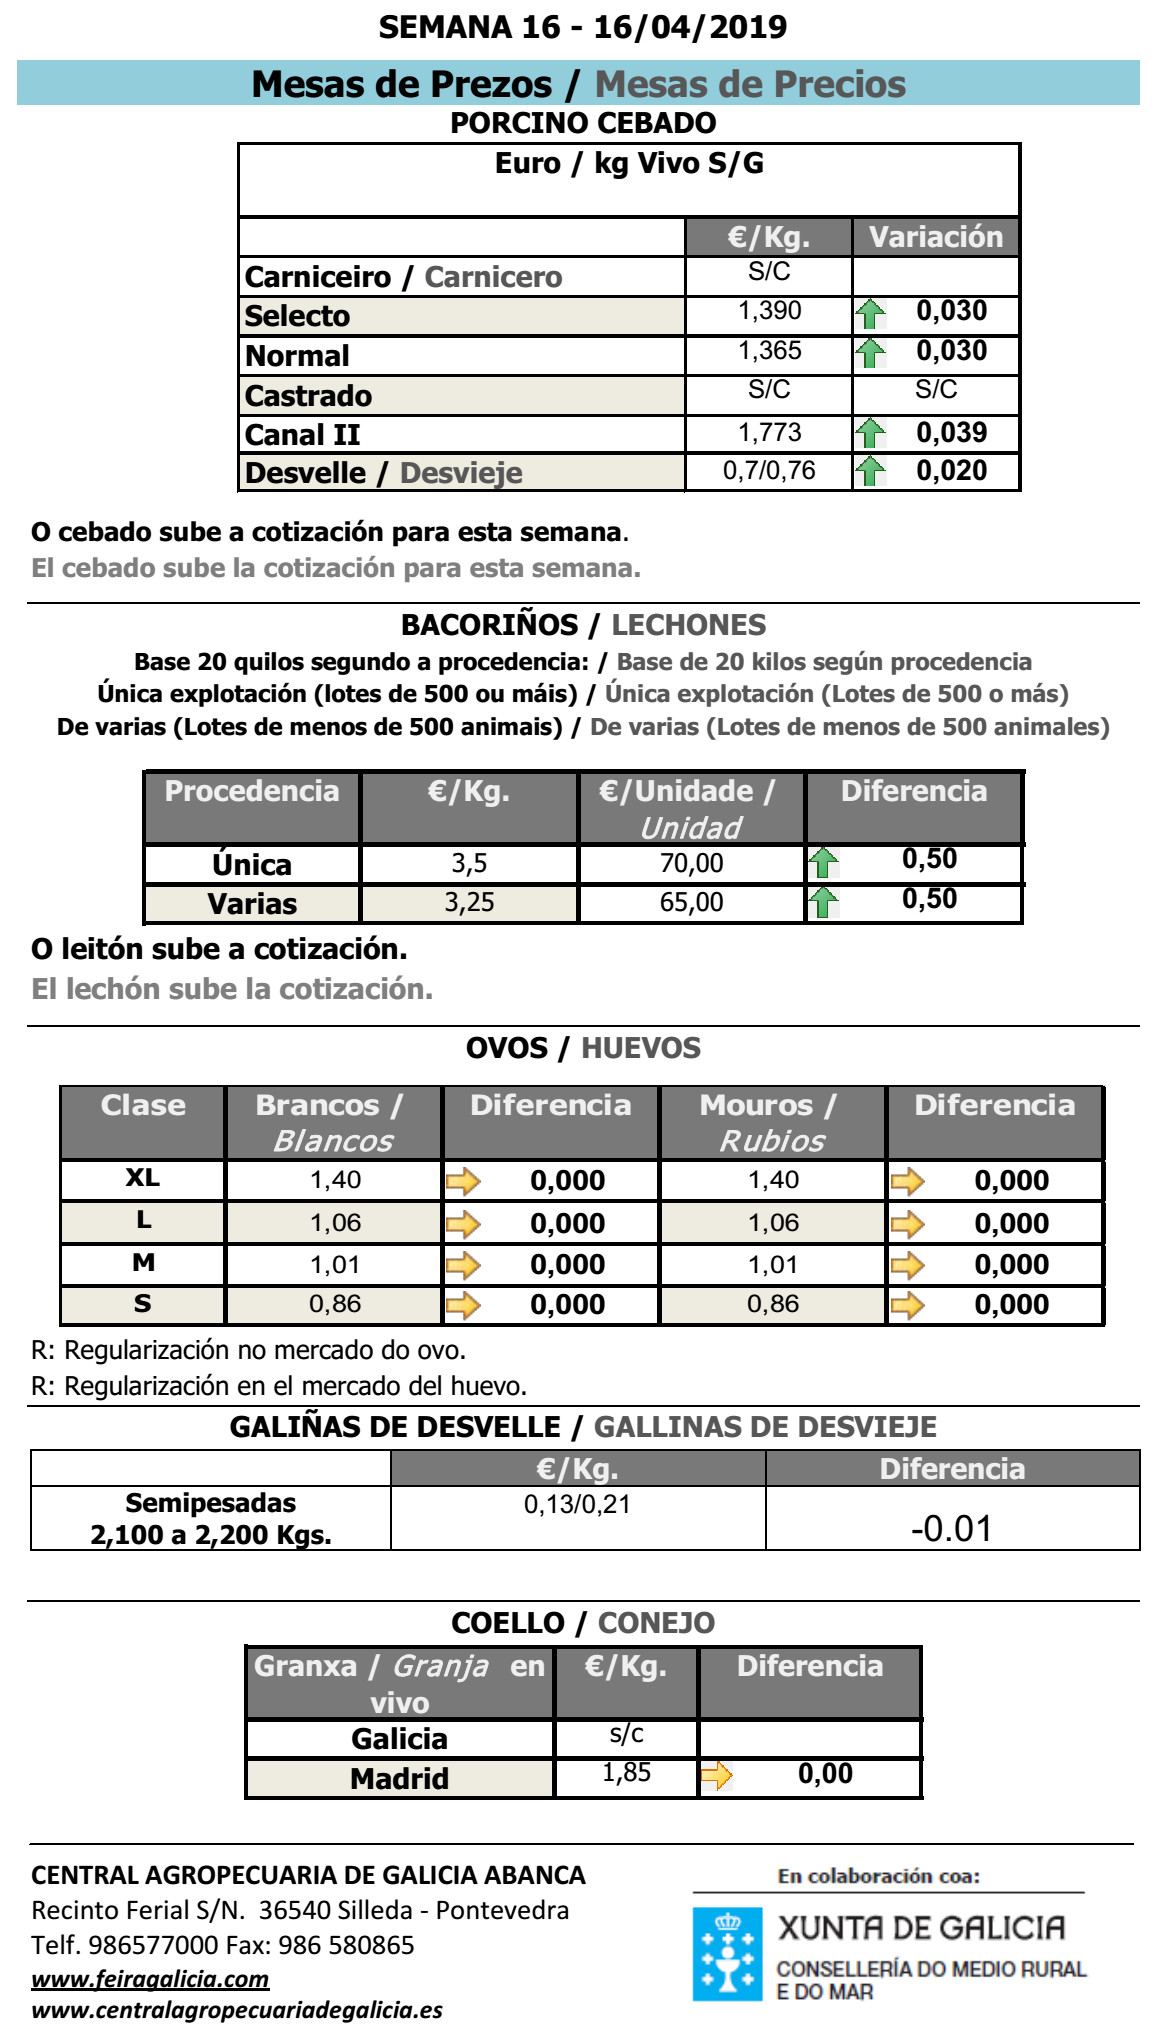 SILLEDA_19_04_03_porcino